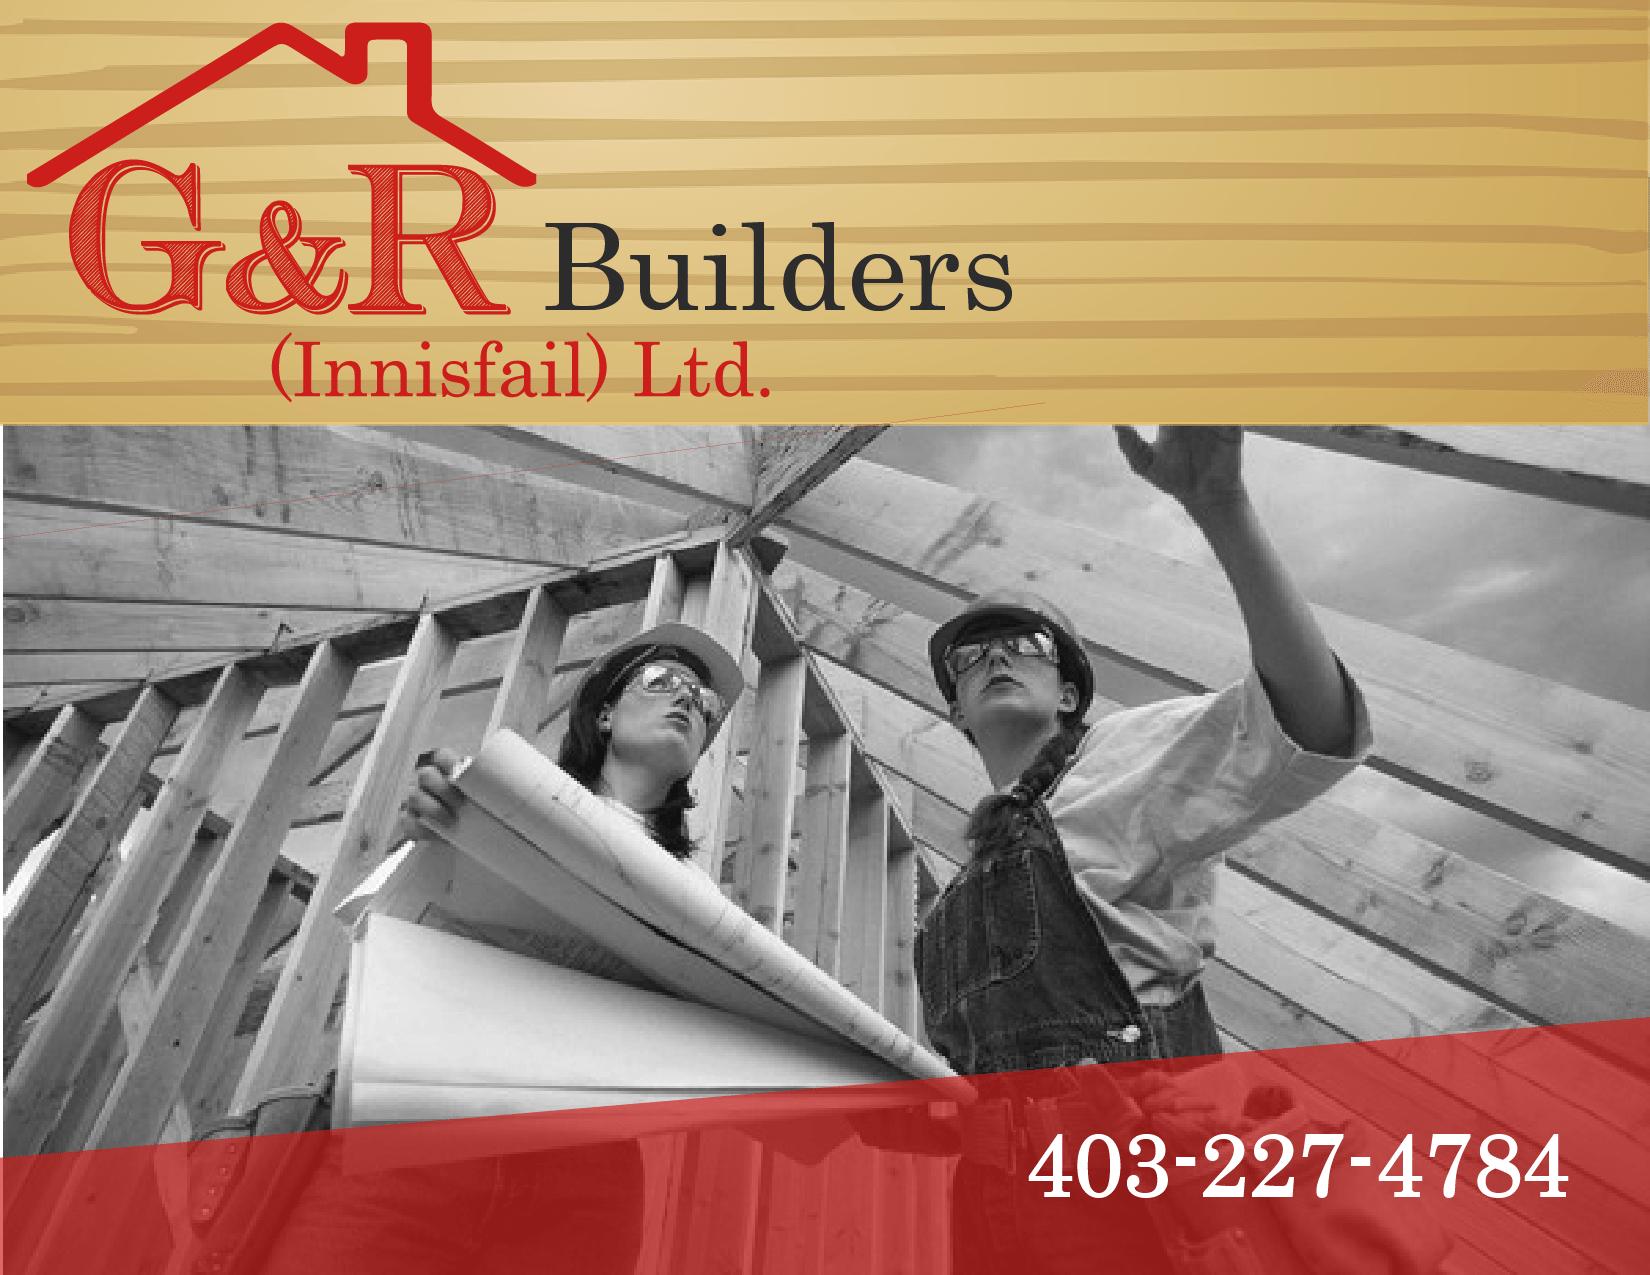 G & R Builders Ltd.